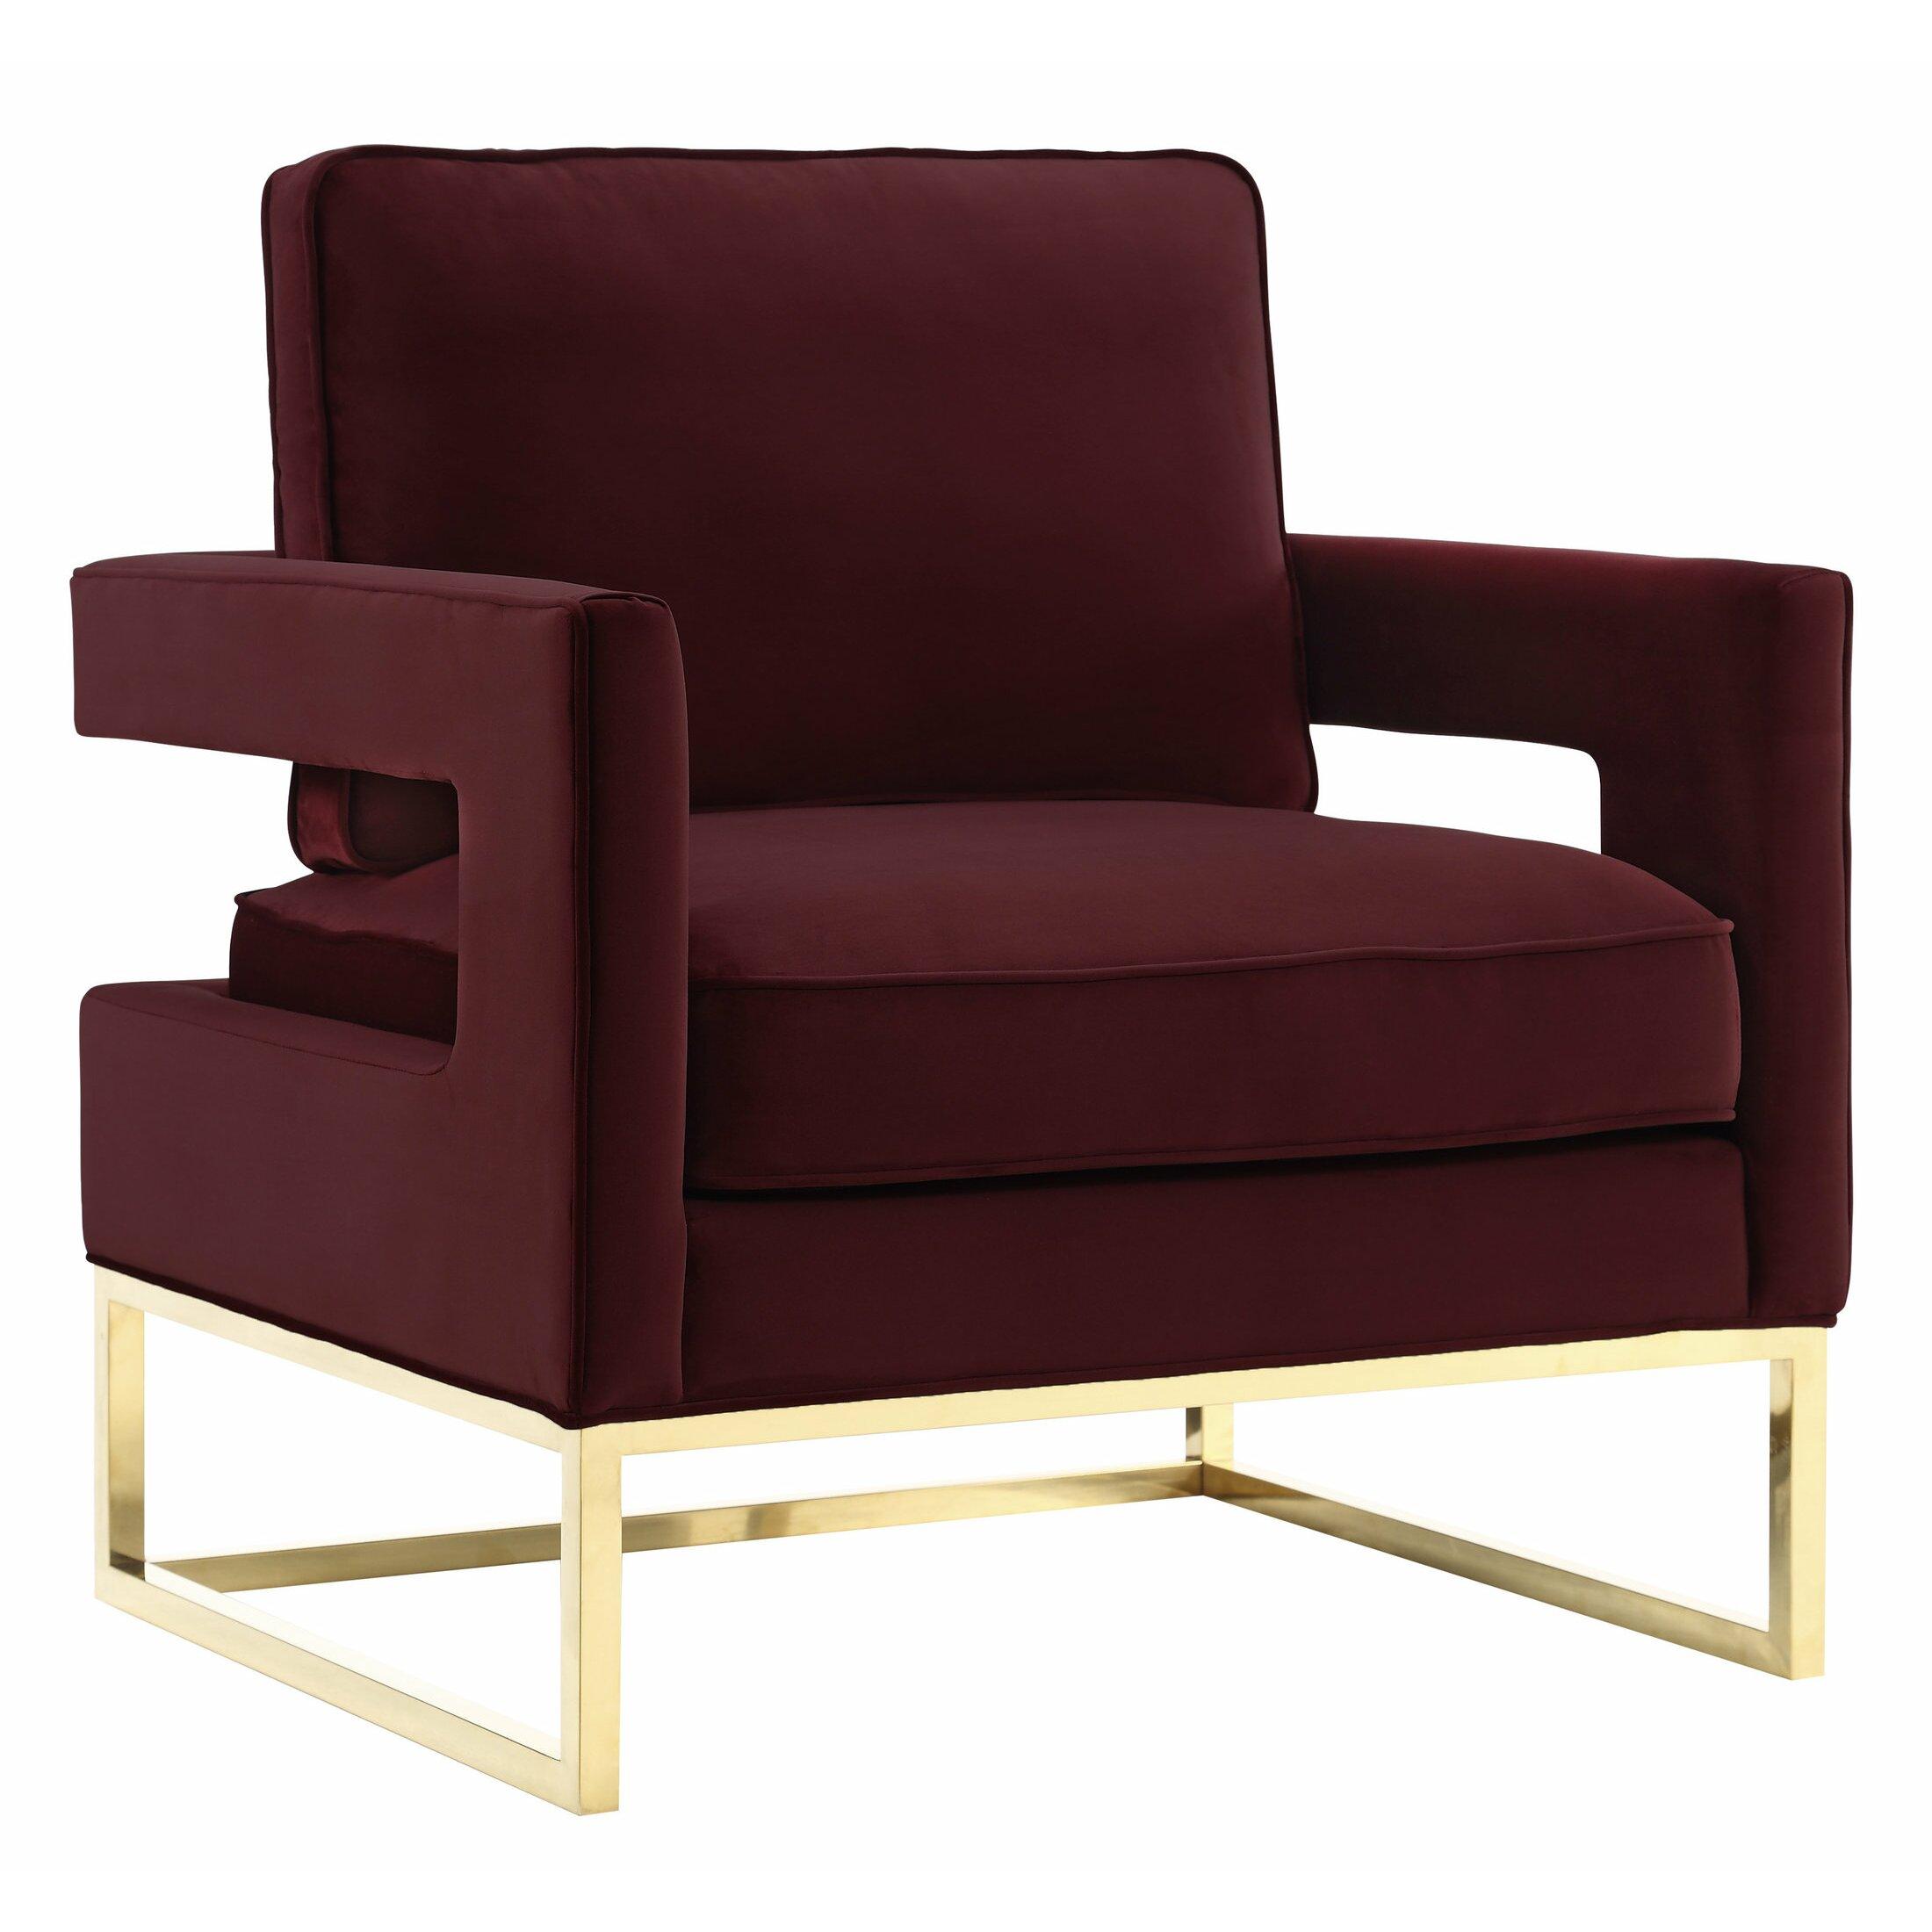 Mercer41 Spade Arm Chair Amp Reviews Wayfair